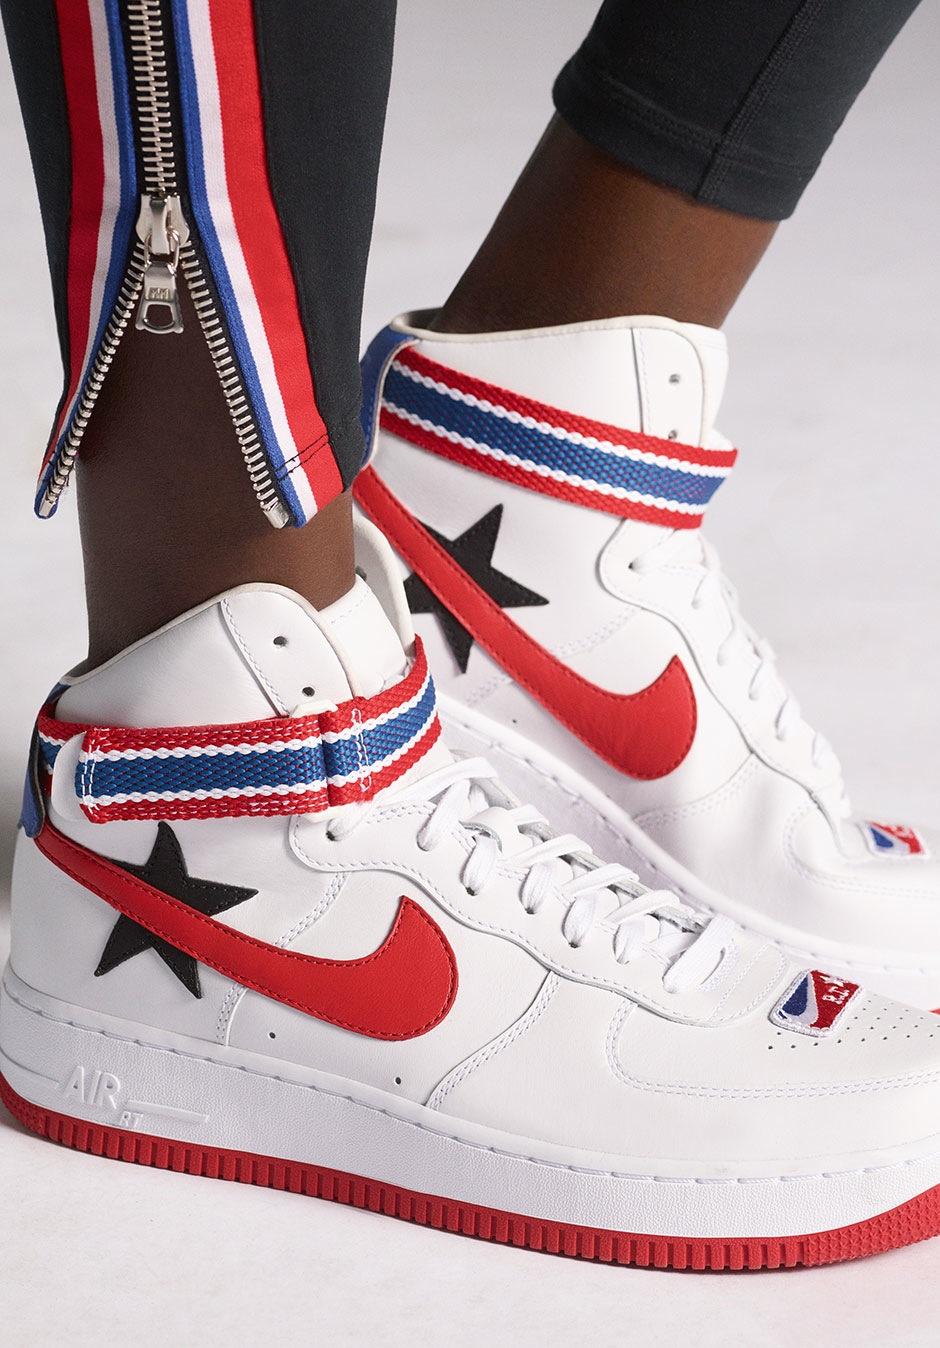 regard détaillé c2b93 89668 Riccardo Tisci x Nike Air Force 1 High - Sneakers.fr